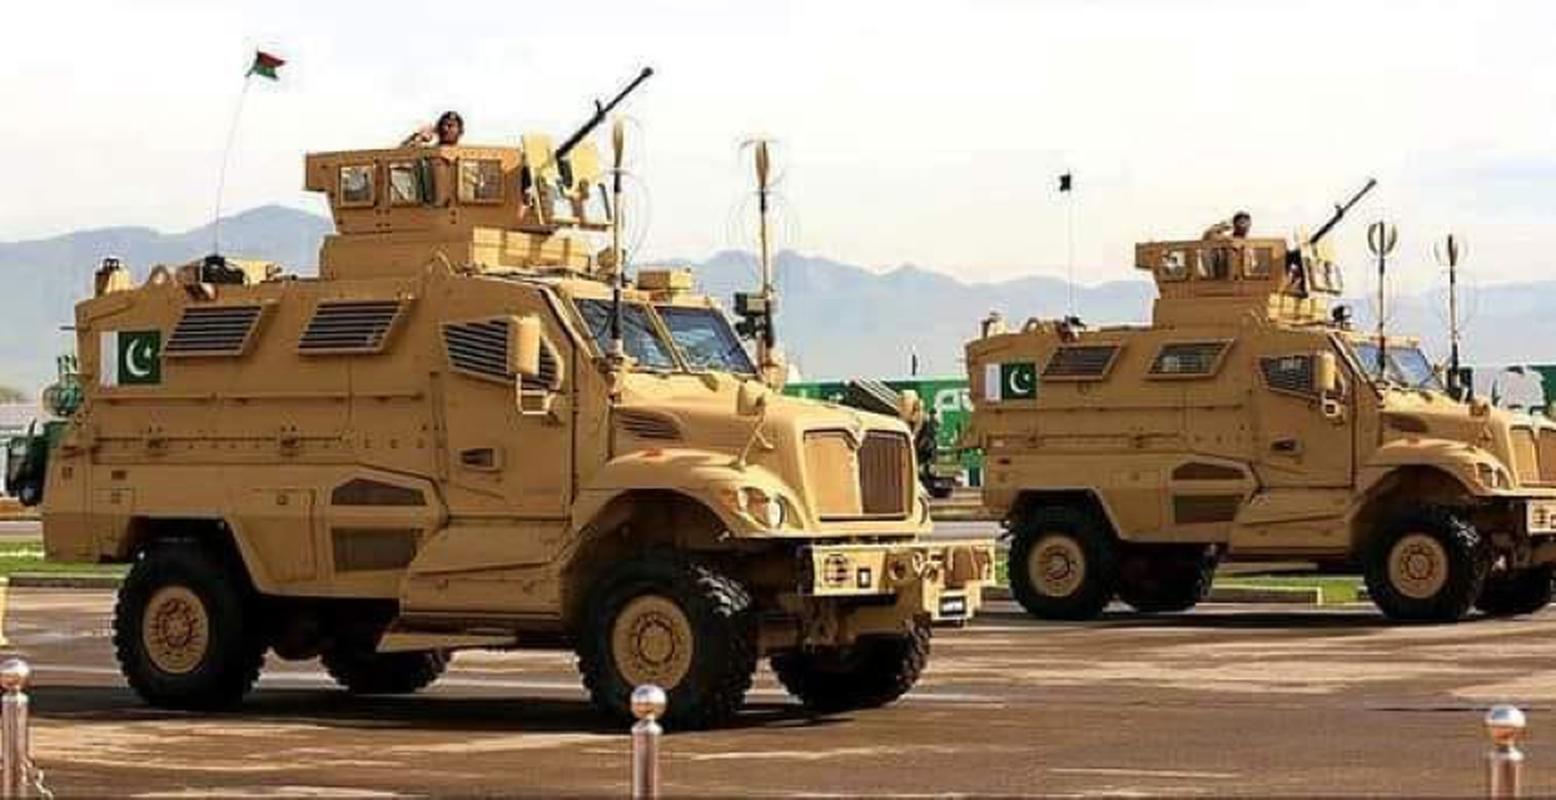 My da 'trao vao tay' Taliban loai xe boc thep khang min tot nhat cua minh-Hinh-15